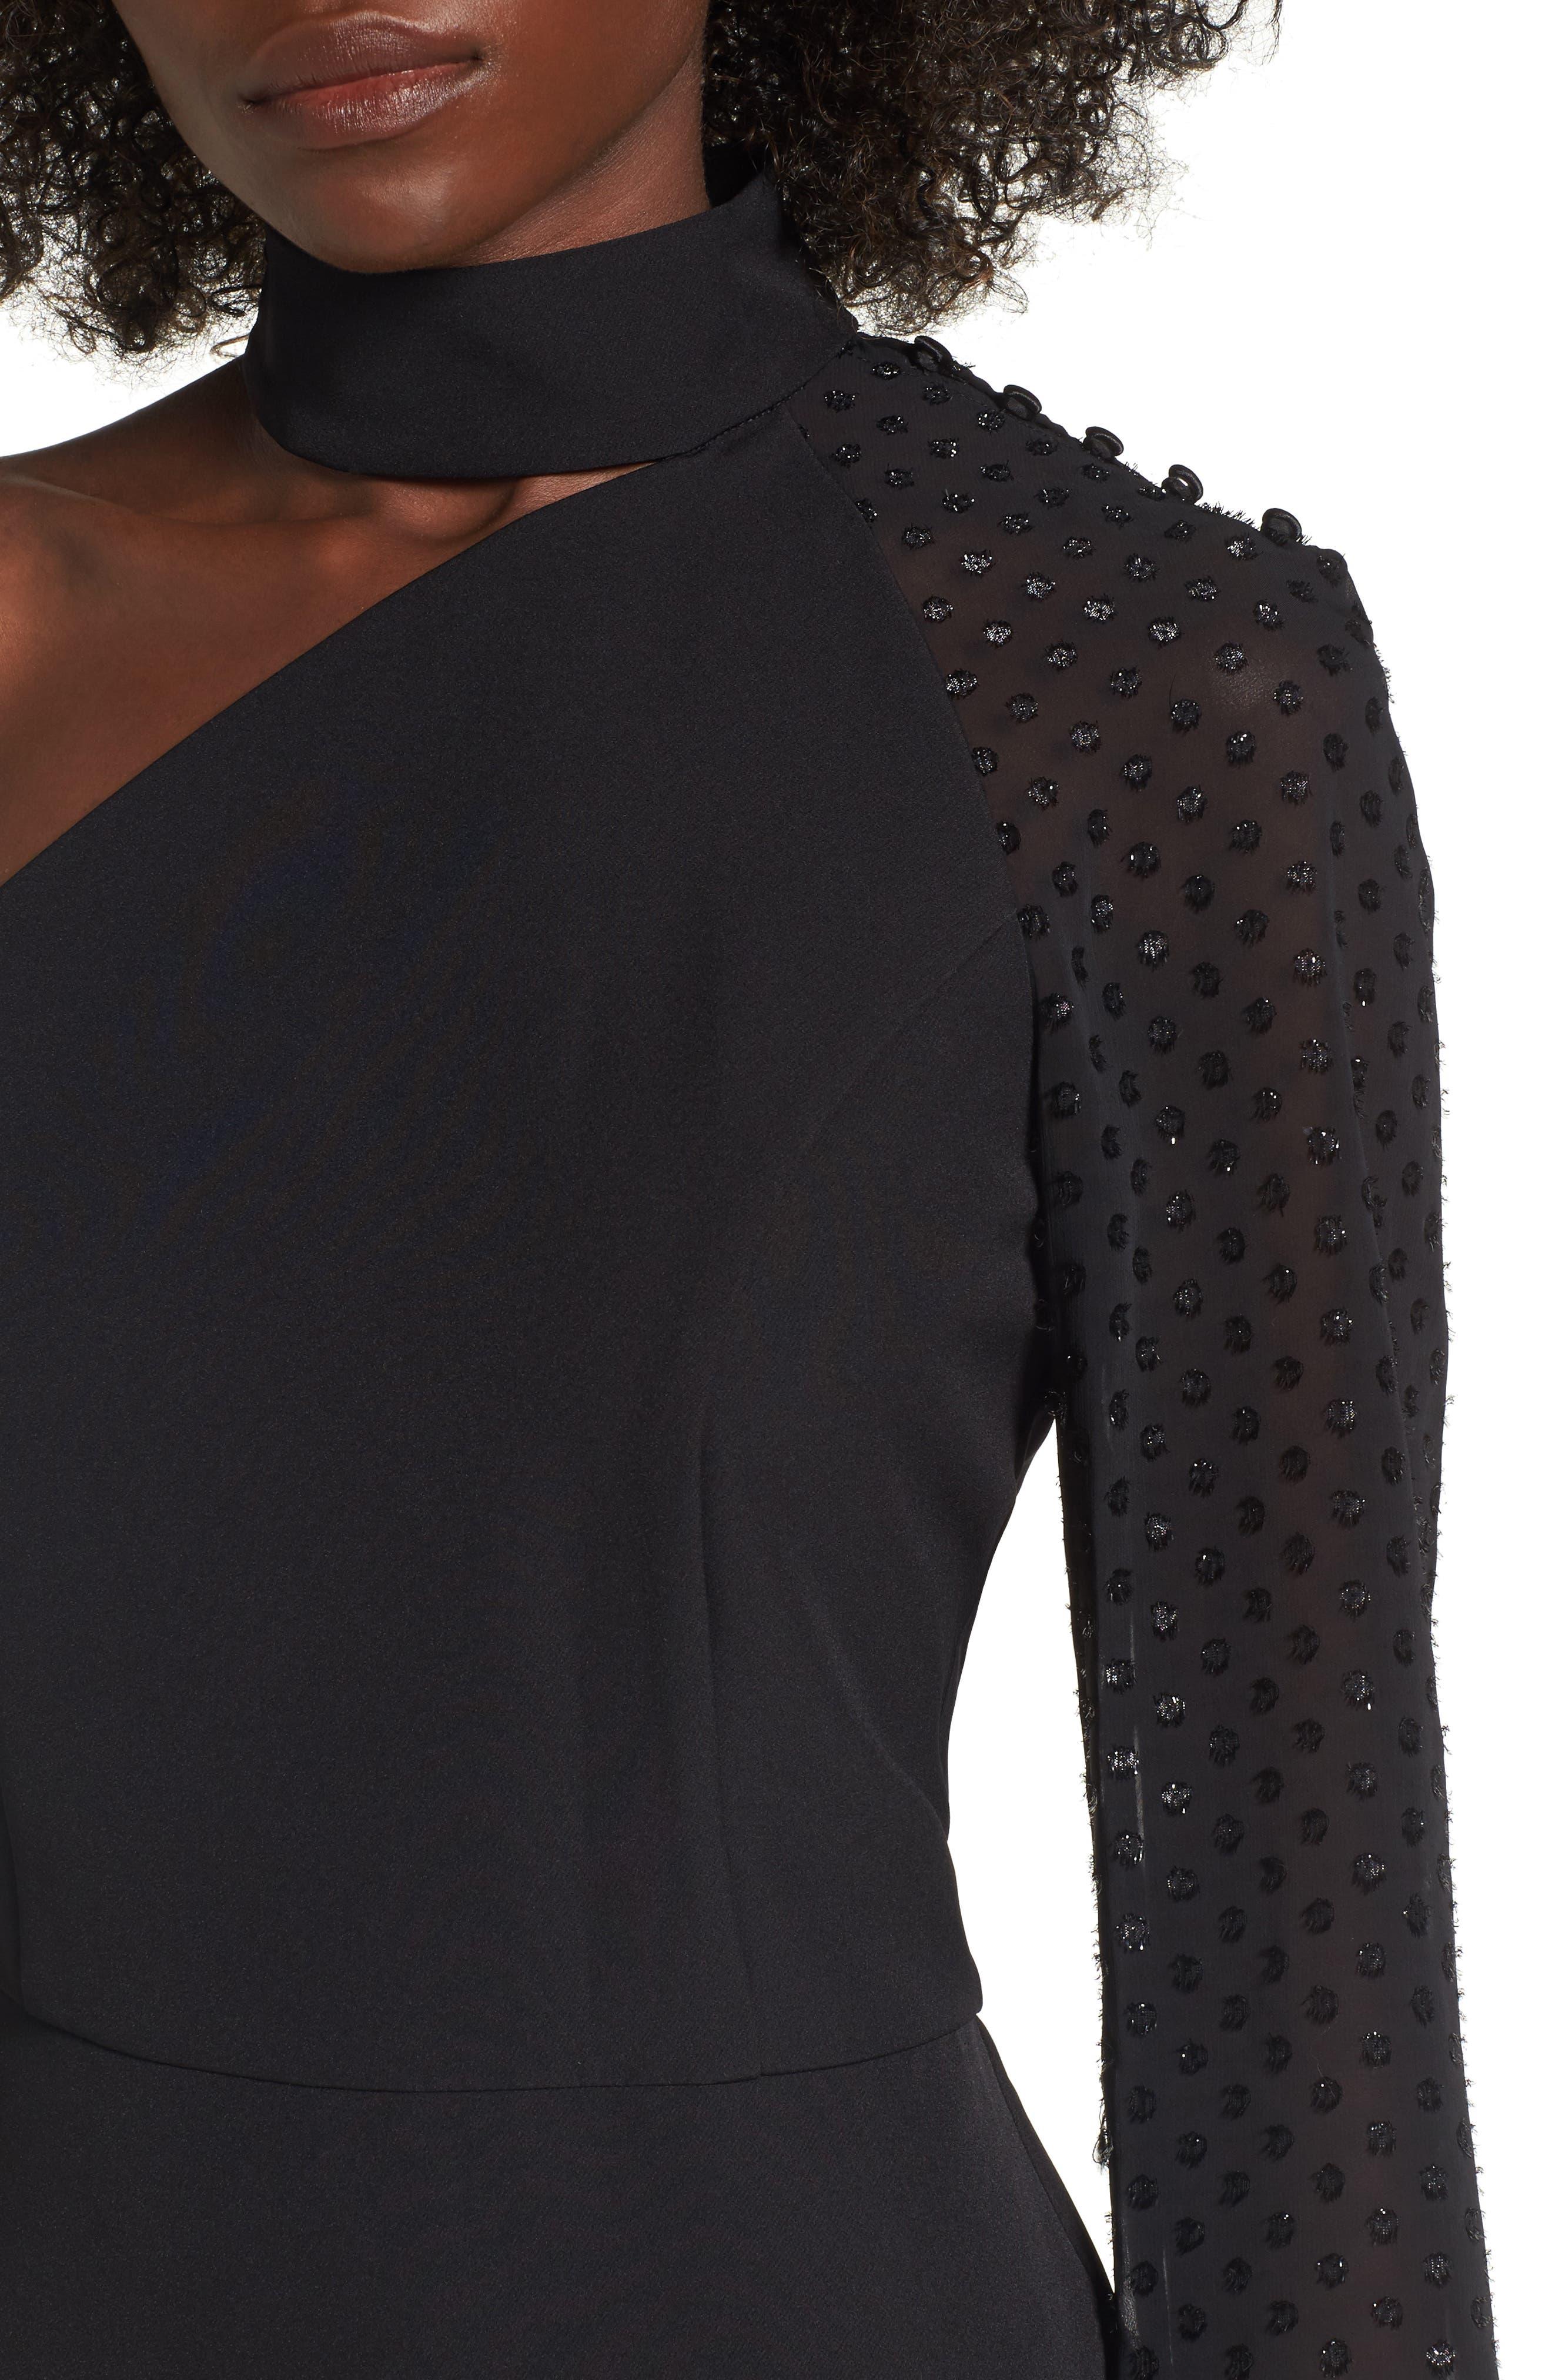 Layne One-Shoulder Dress,                             Alternate thumbnail 4, color,                             001